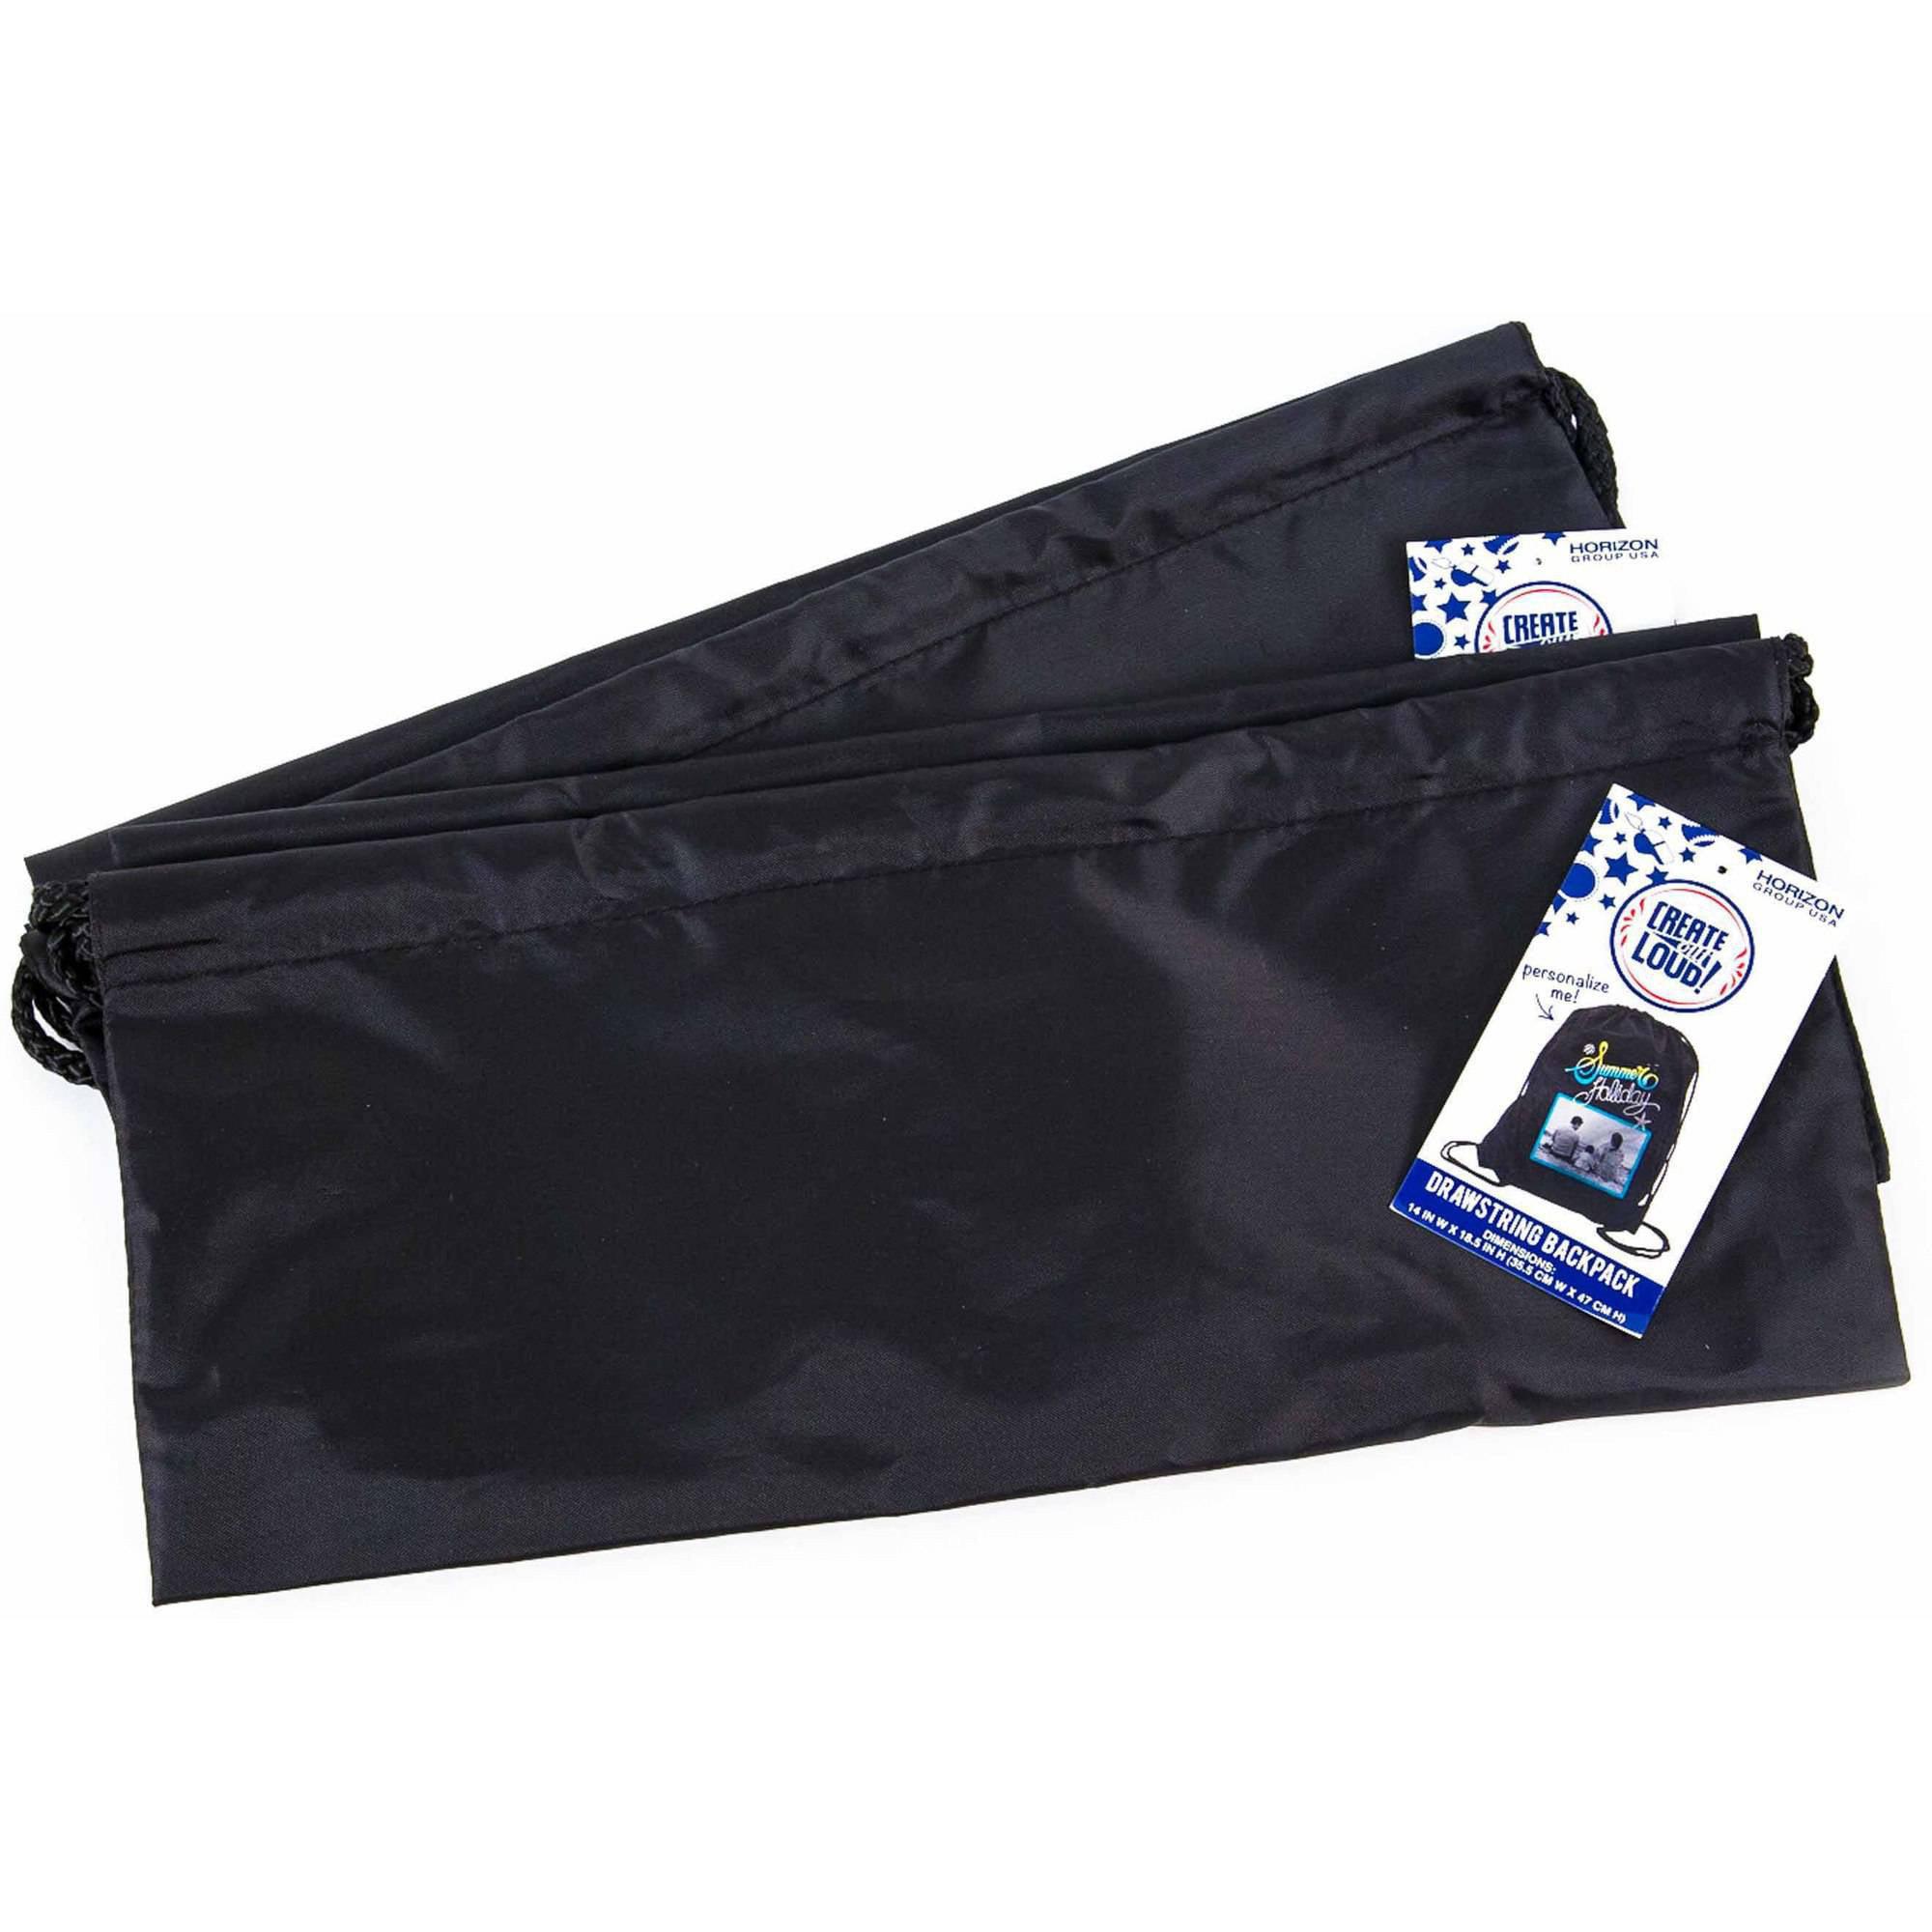 Horizon Group USA Create Out Loud Black Drawstring Bag, 2pk